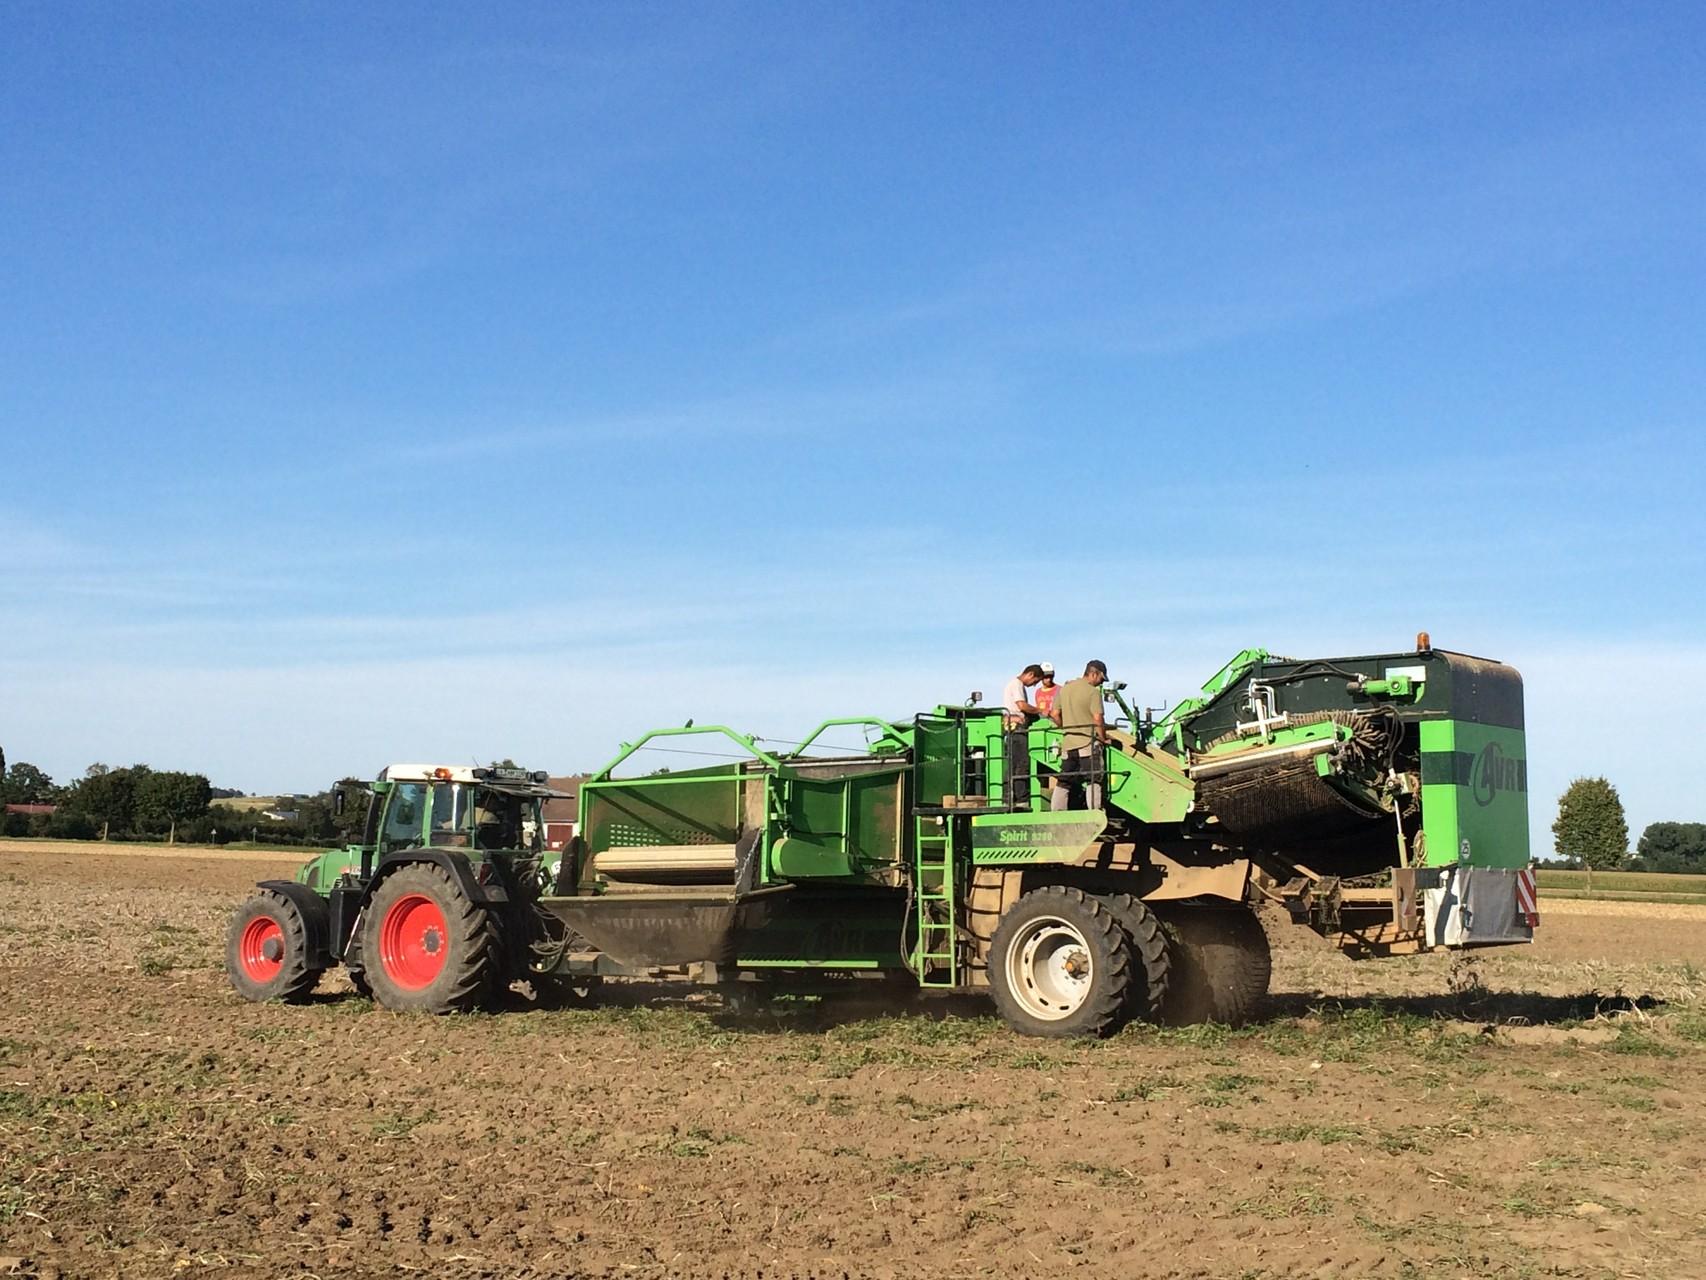 Die Kartoffelernte 2015 unter enormer Trockenheit